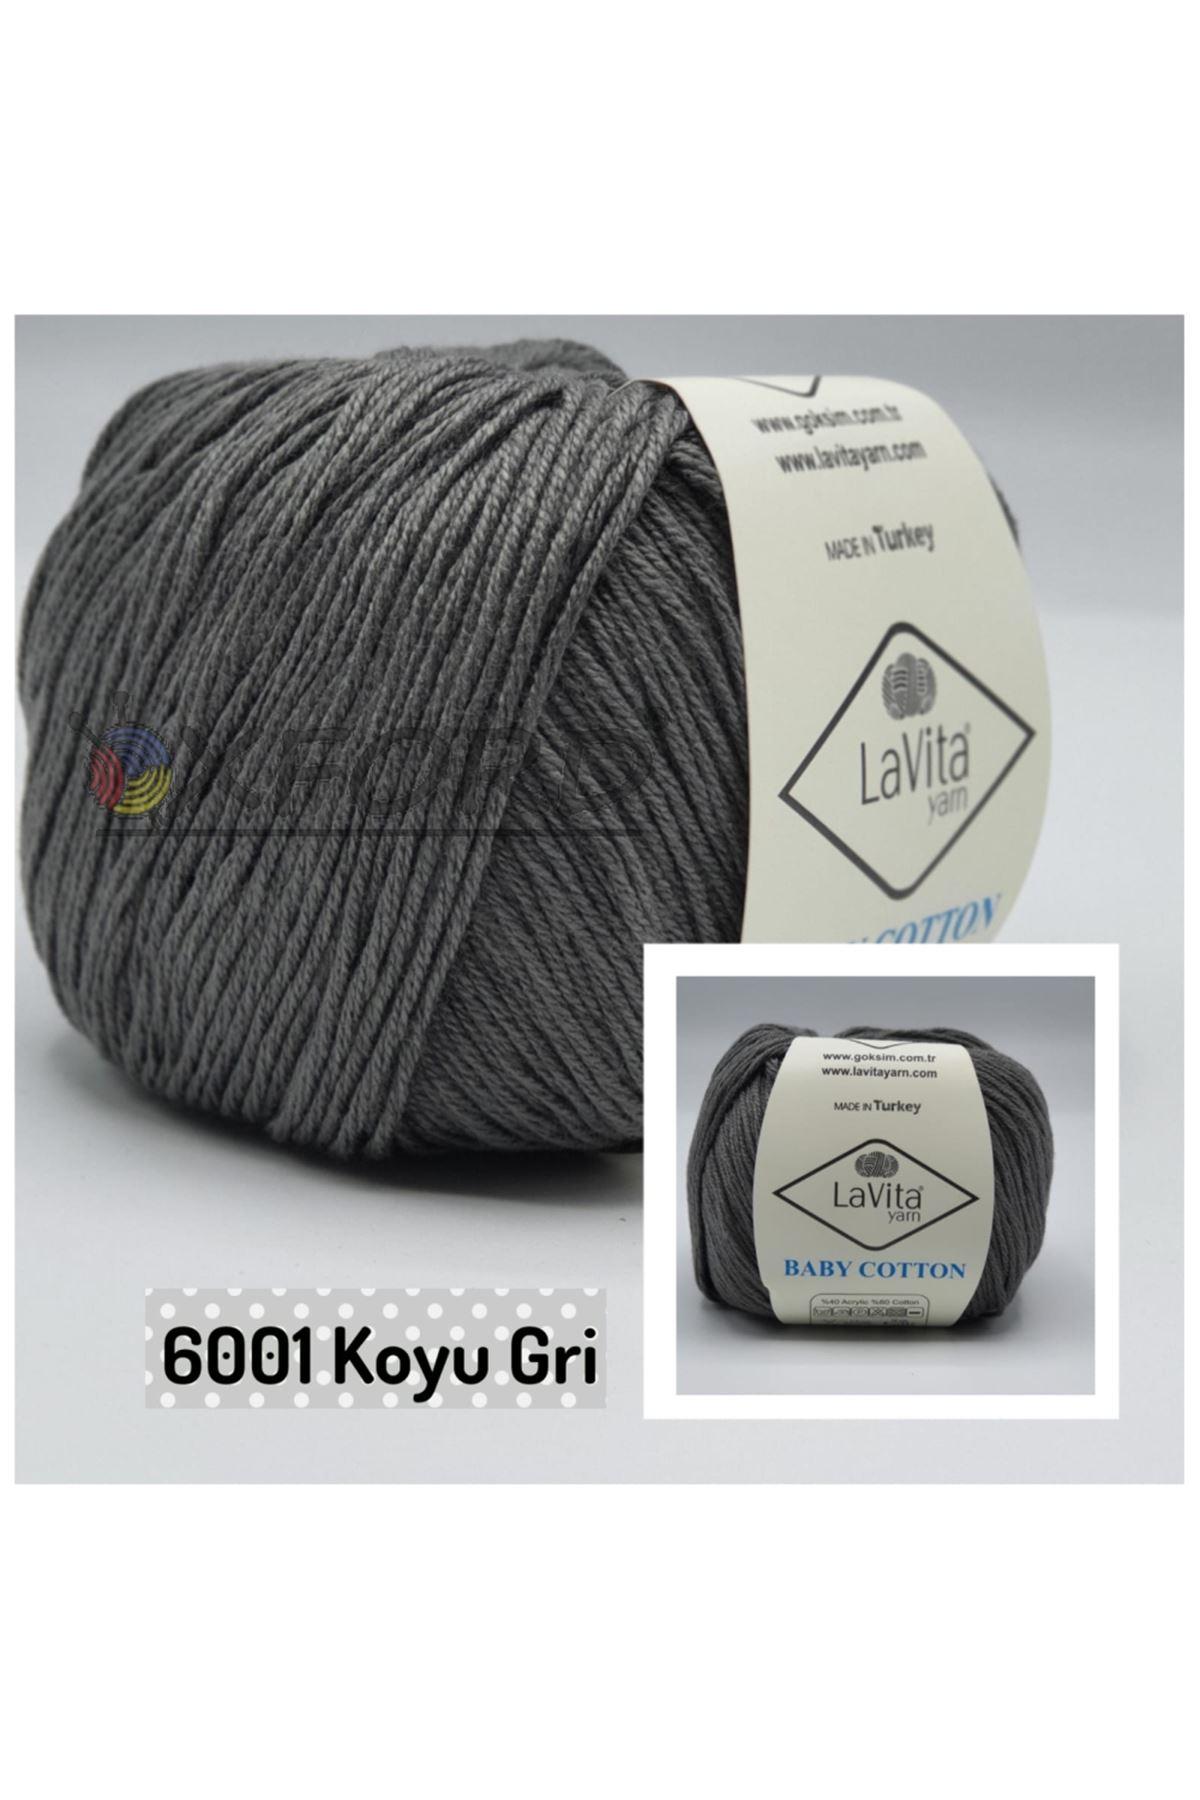 Lavita Baby Cotton 6001 Koyu Gri